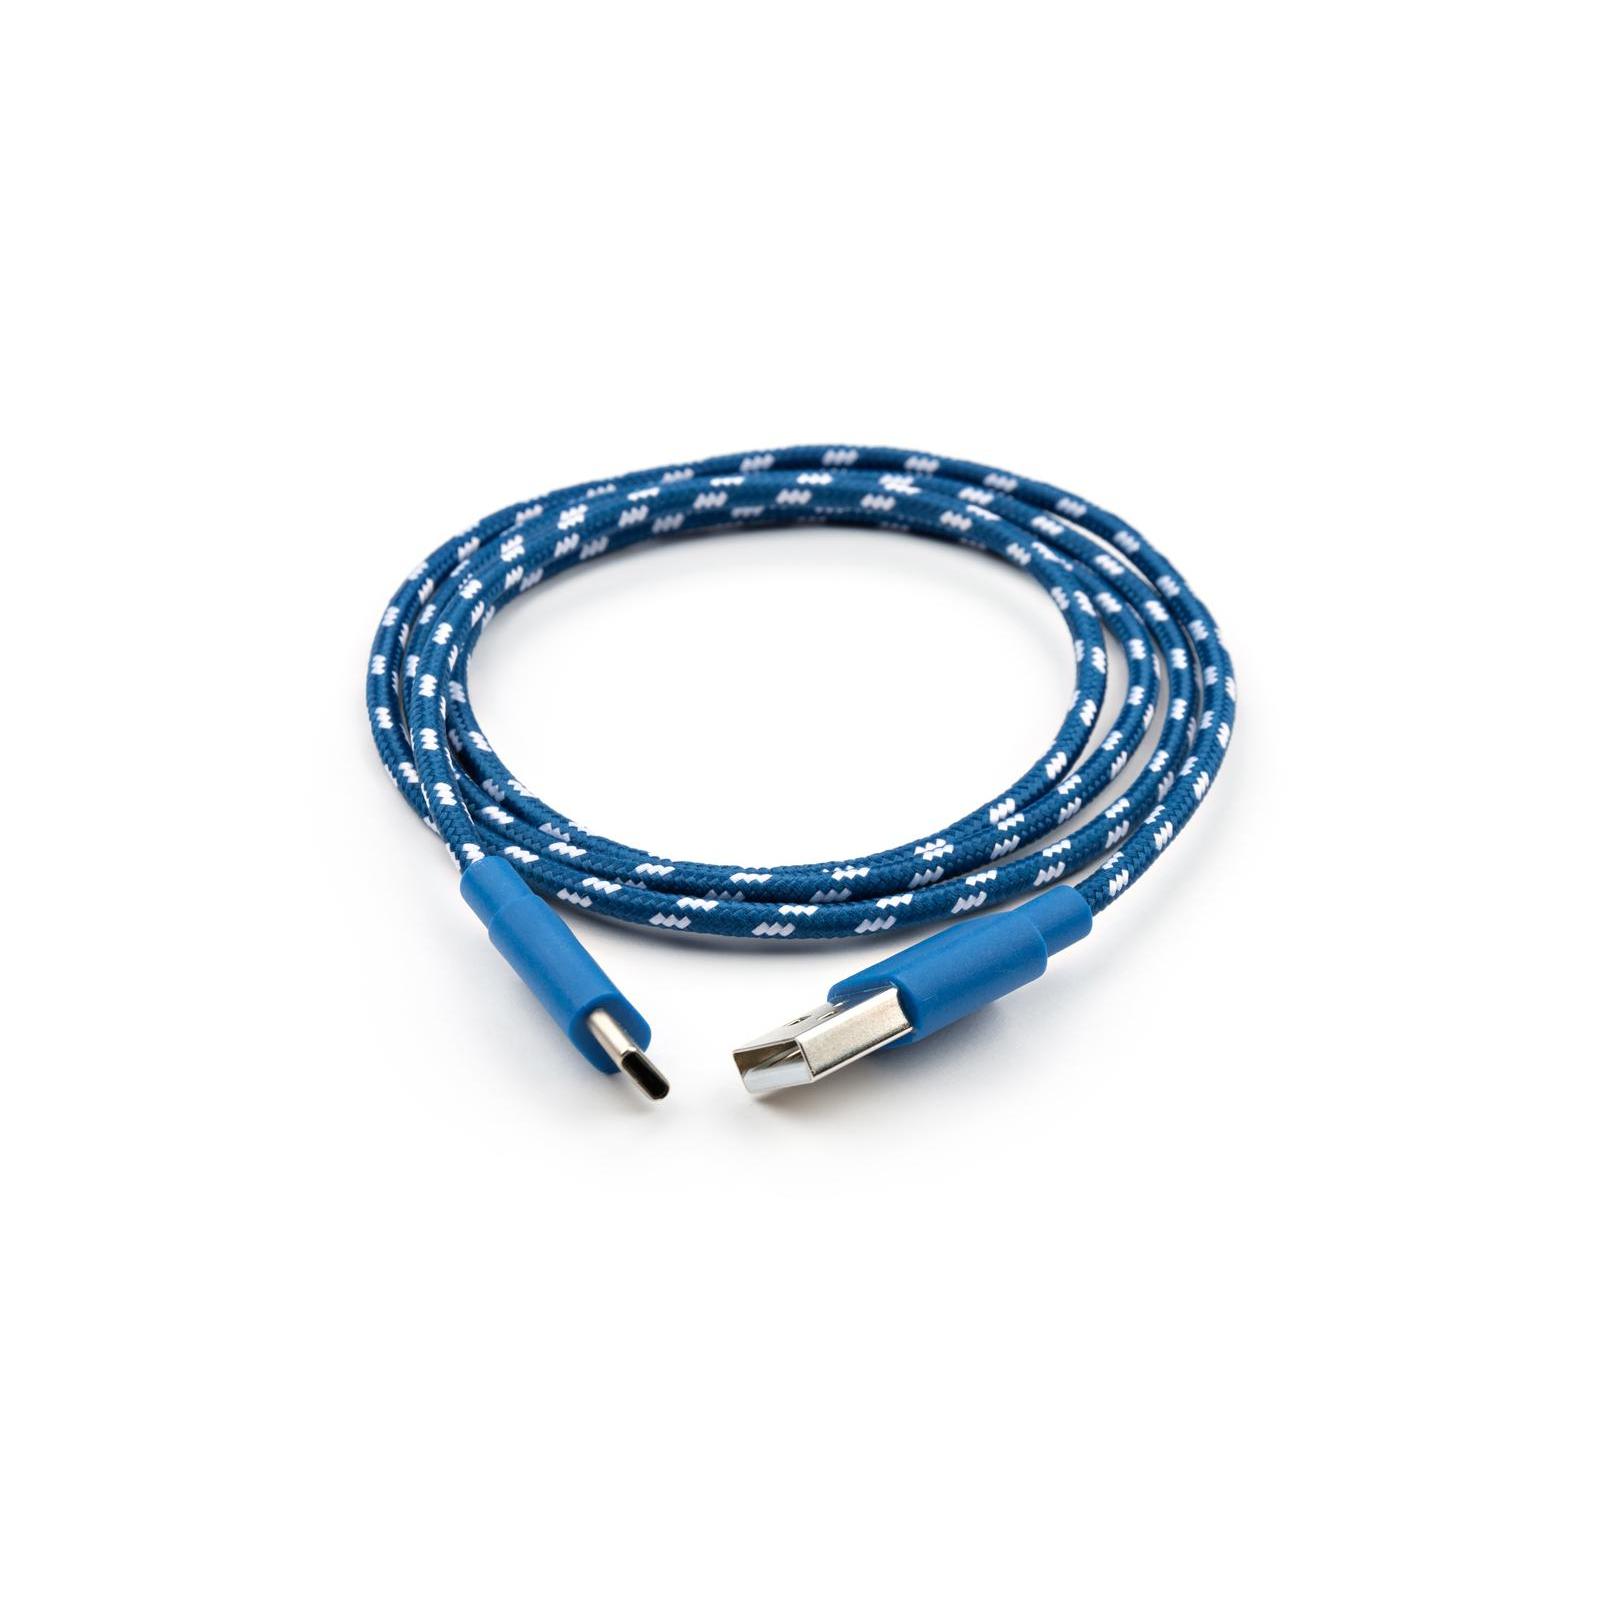 Дата кабель USB 2.0 AM to Type-C 2color nylon 1m blue Vinga (VCPDCTCNB31B) изображение 2